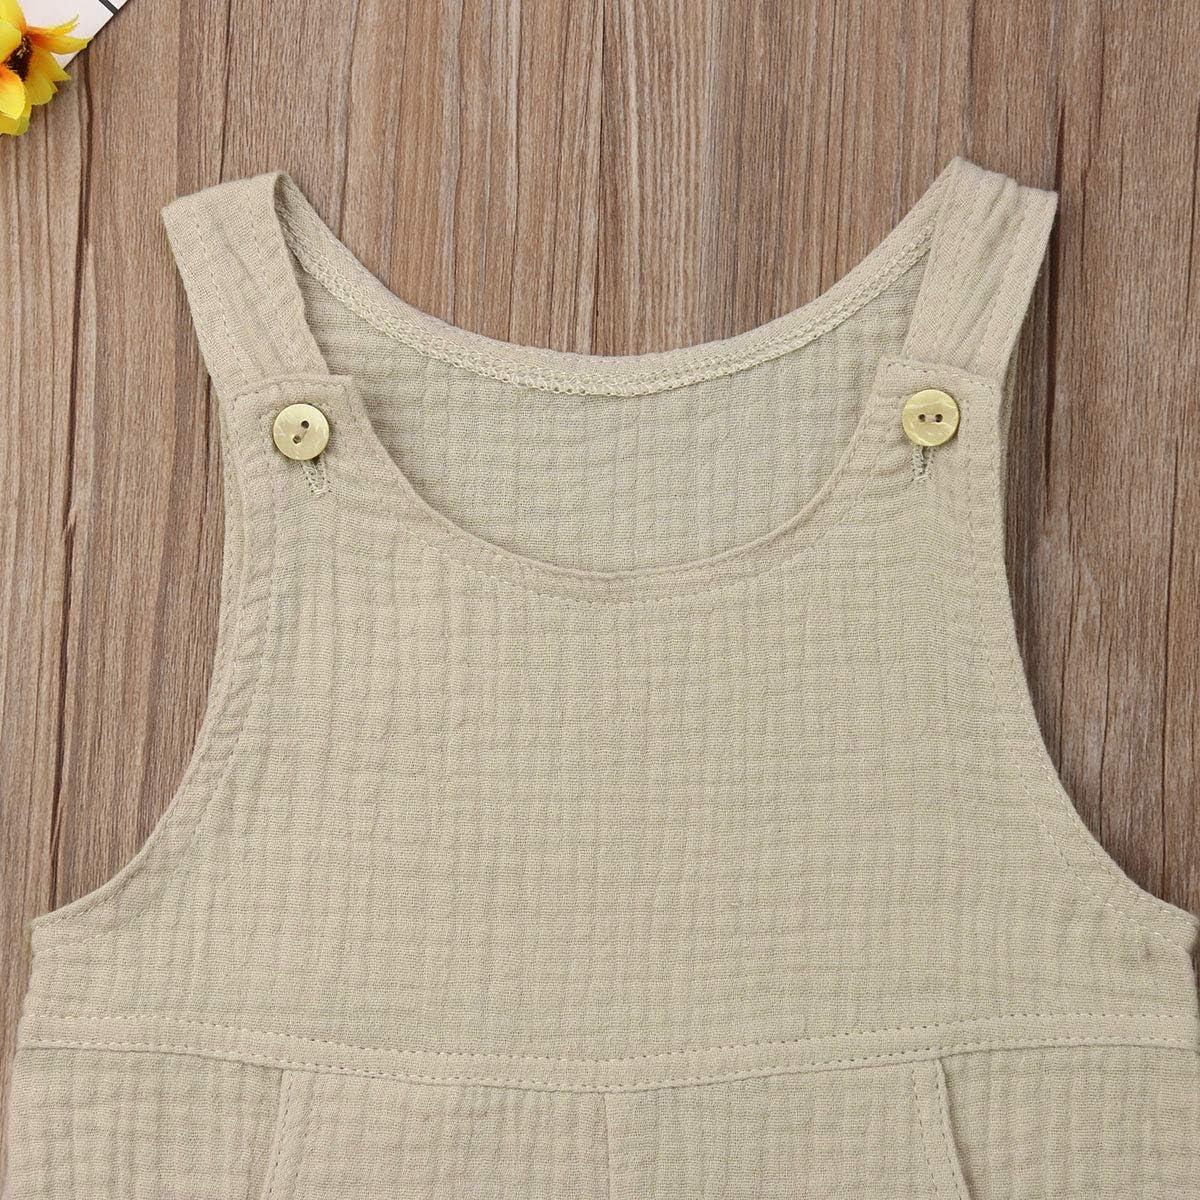 CIPOGL Neugeborenes Kleinkind Baby Jungen M/ädchen Leinen Strampler Kurz Body Overall Overall Kleidung Outfit Set